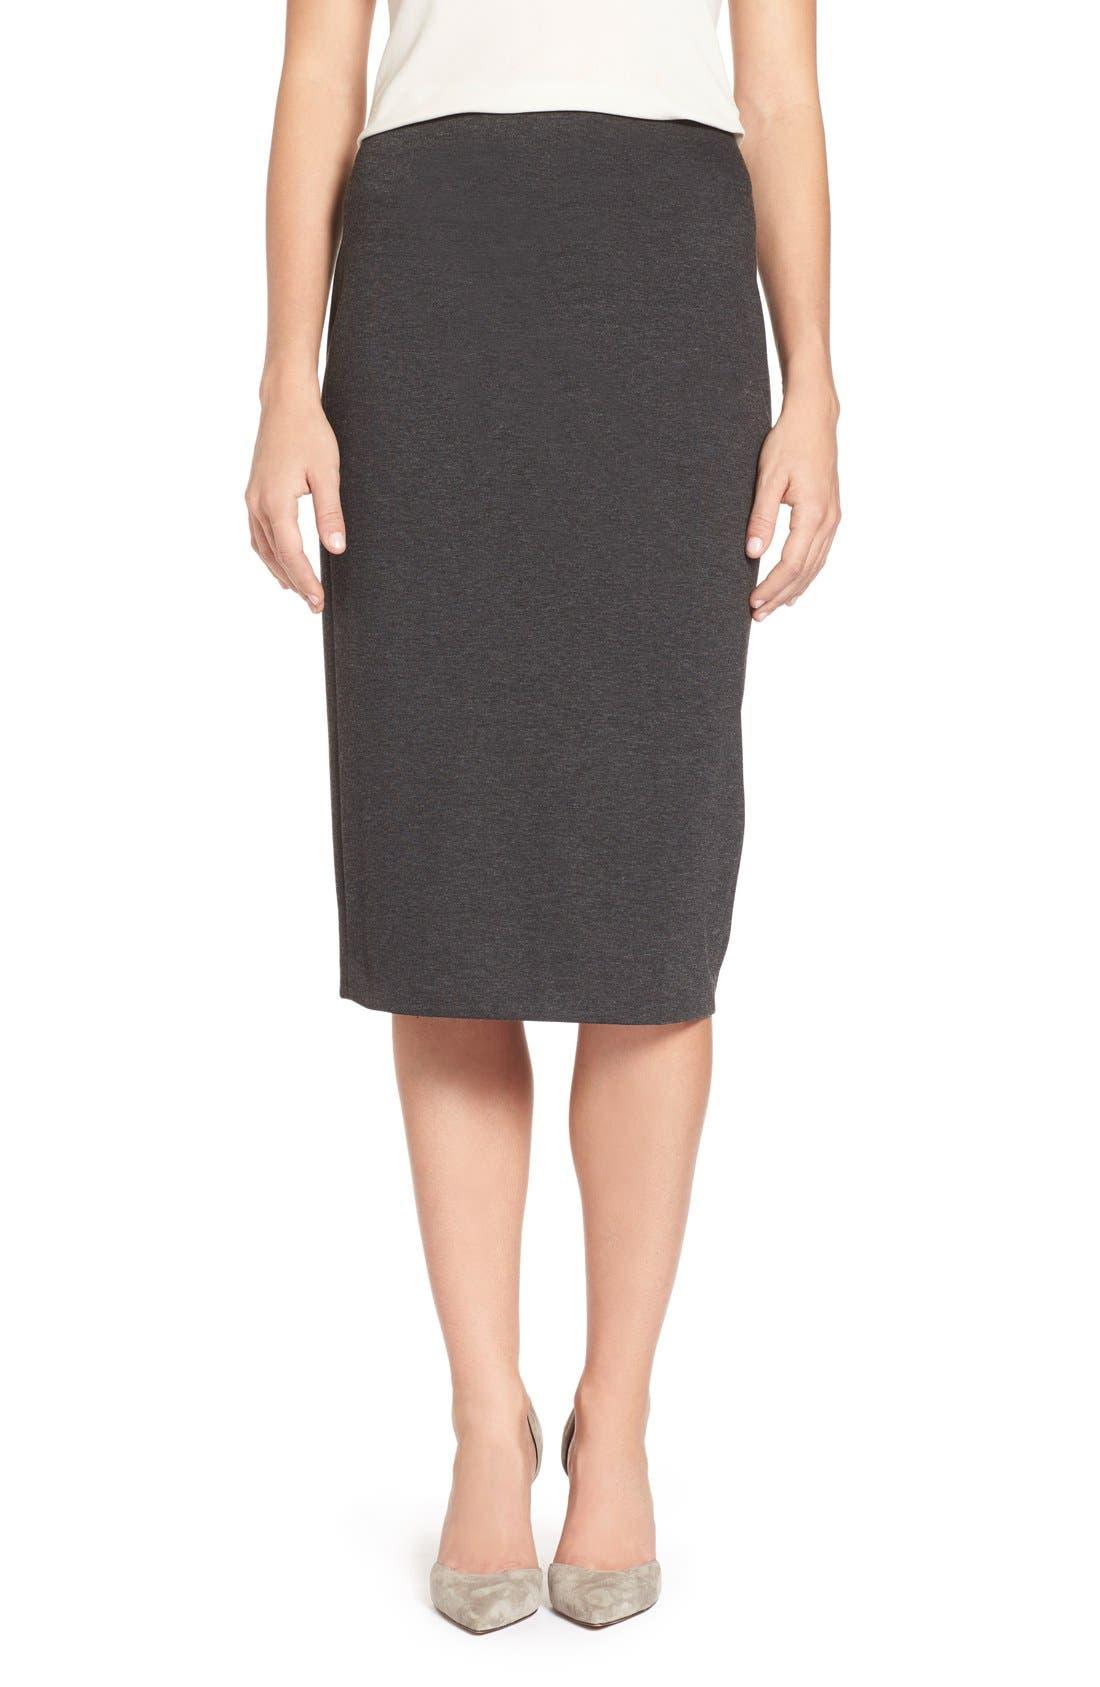 Alternate Image 1 Selected - Vince Camuto Ponte Midi Skirt (Regular & Petite)